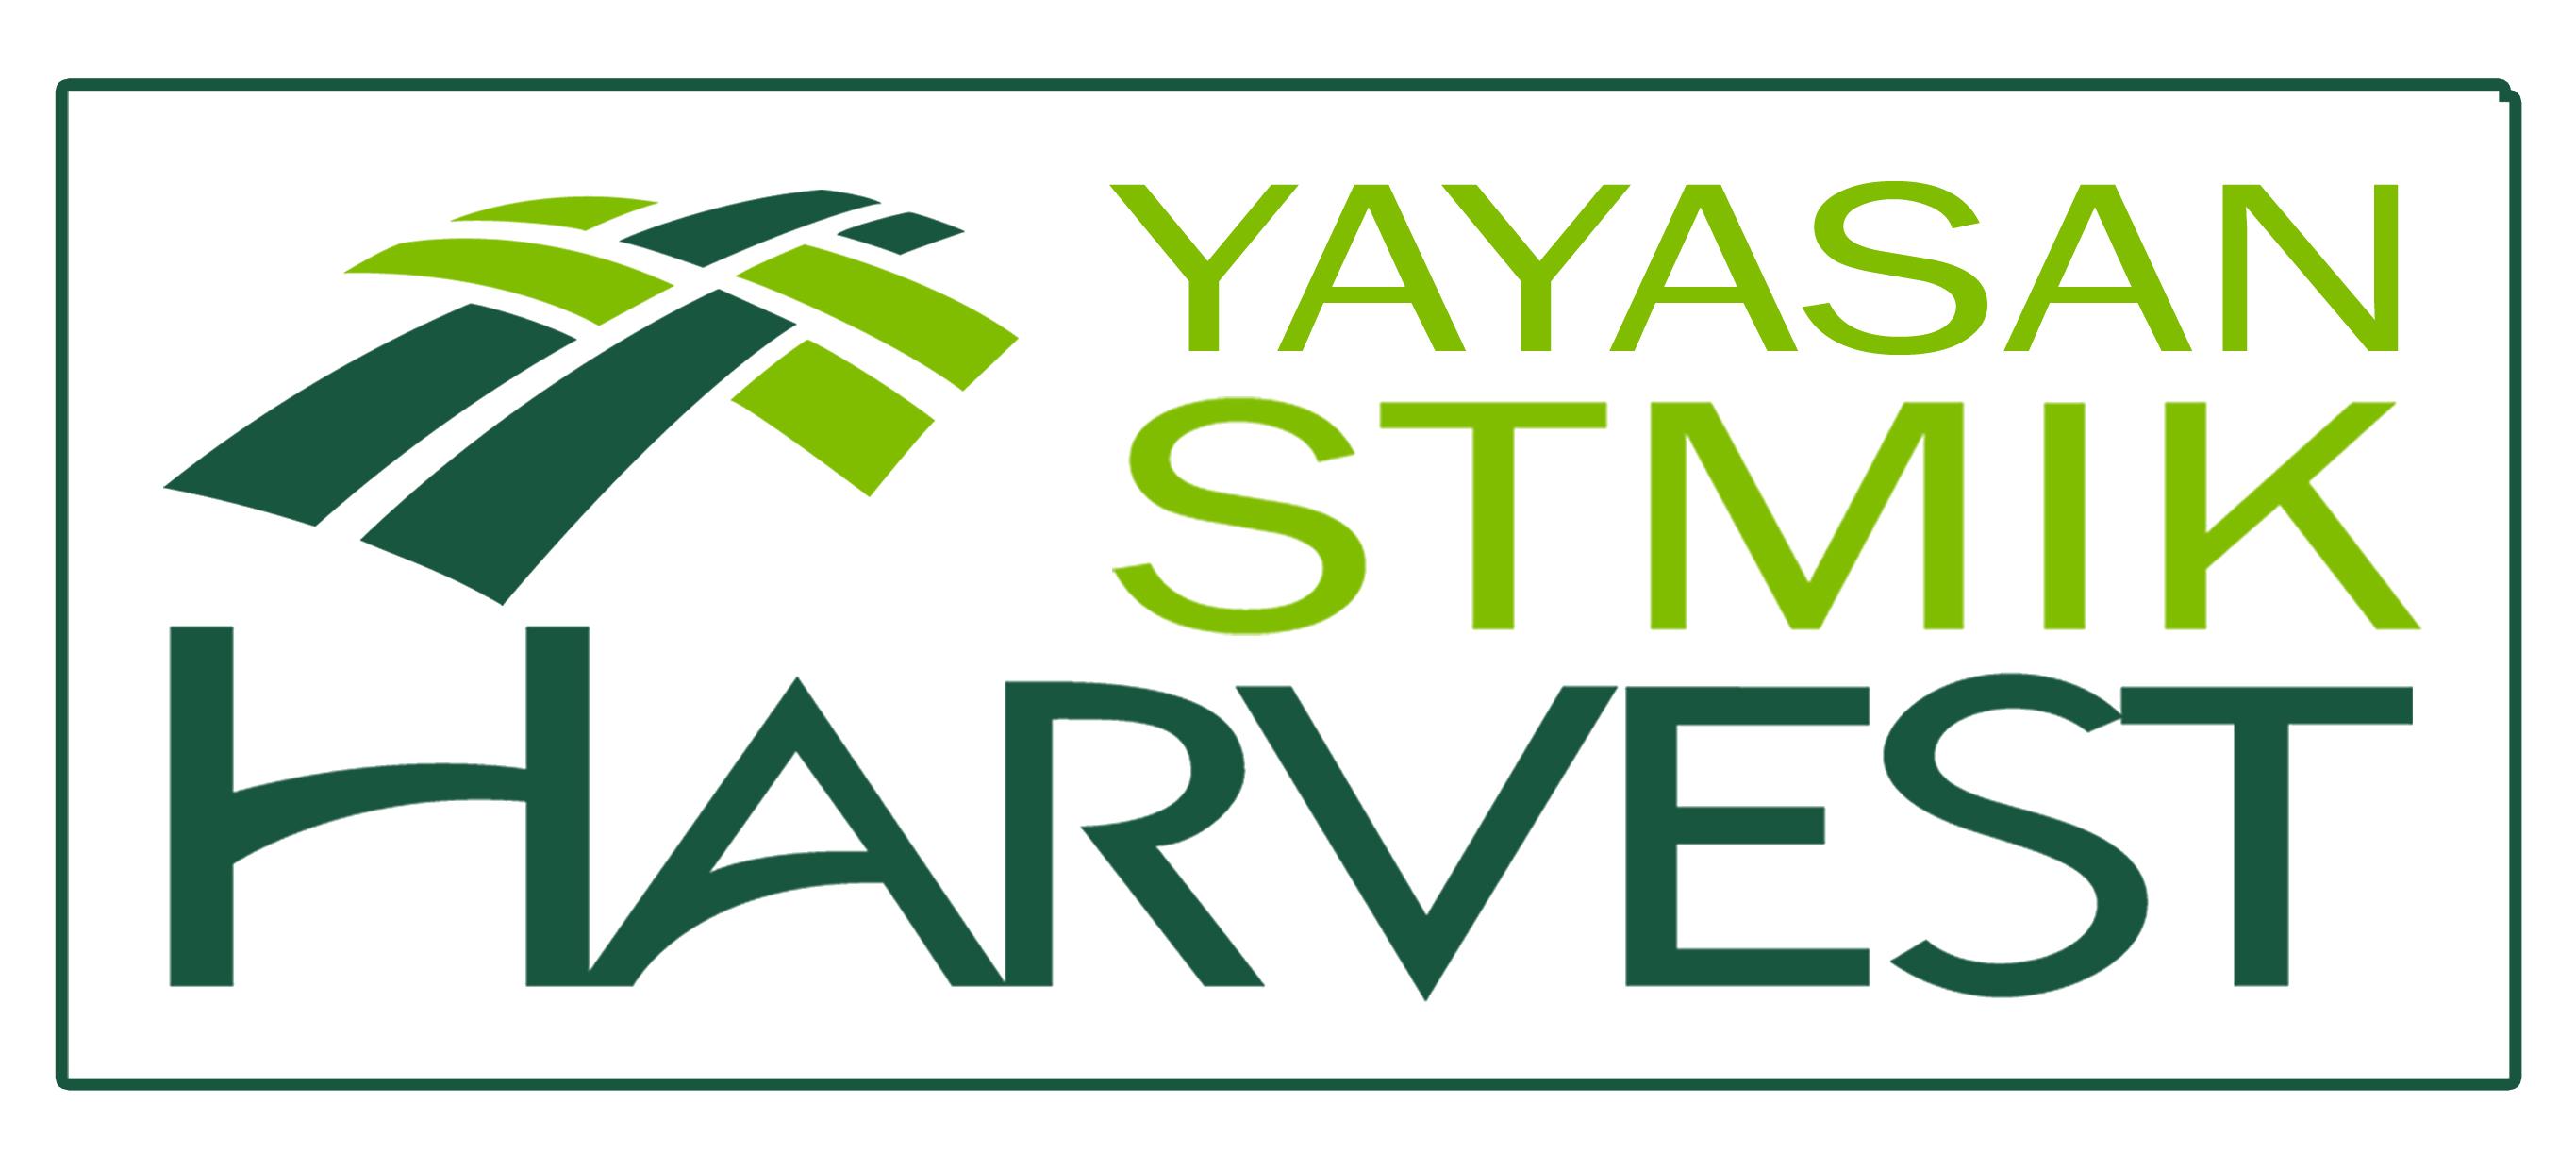 Pendukung - Yayasan STMIK Harvest - World Harvest Indonesia - Impacting the World Through Creative Community, Education and Media Services